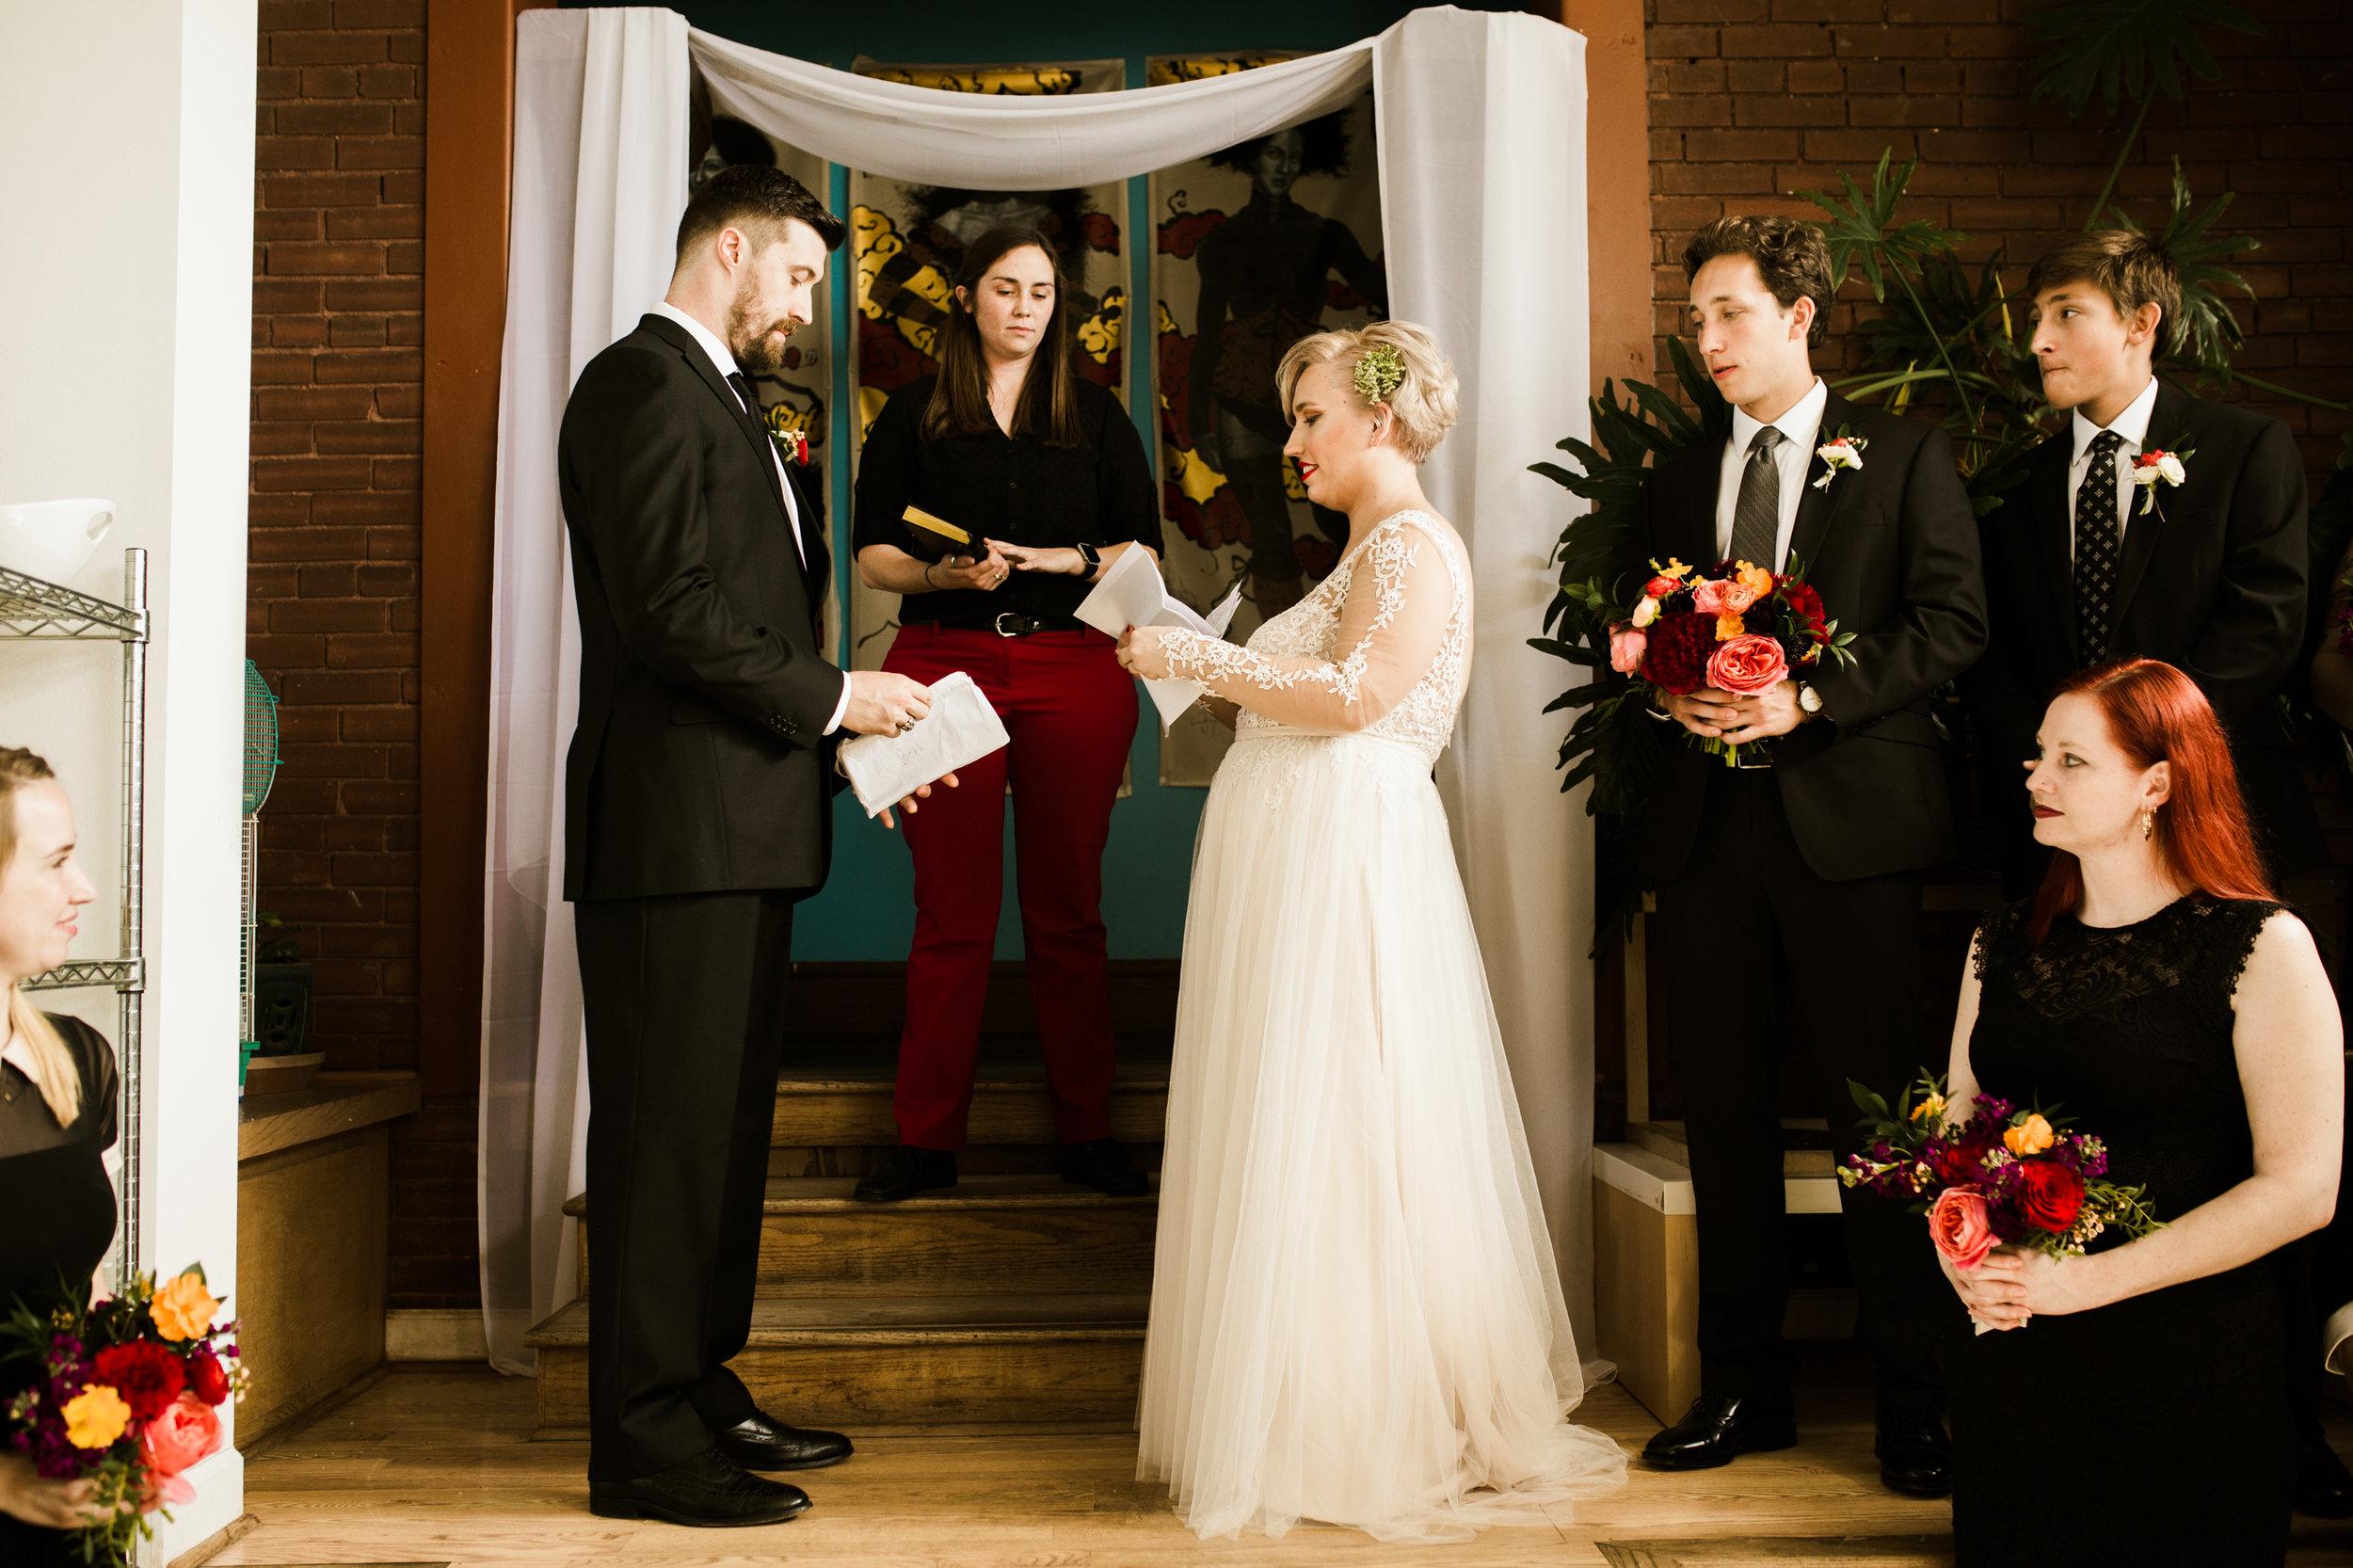 Kentucky Wedding Louisville Wedding Photographer 2018 Crystal Ludwick Photo Louisville Wedding Photographer Kentucky Wedding Photographer (34 of 105).jpg